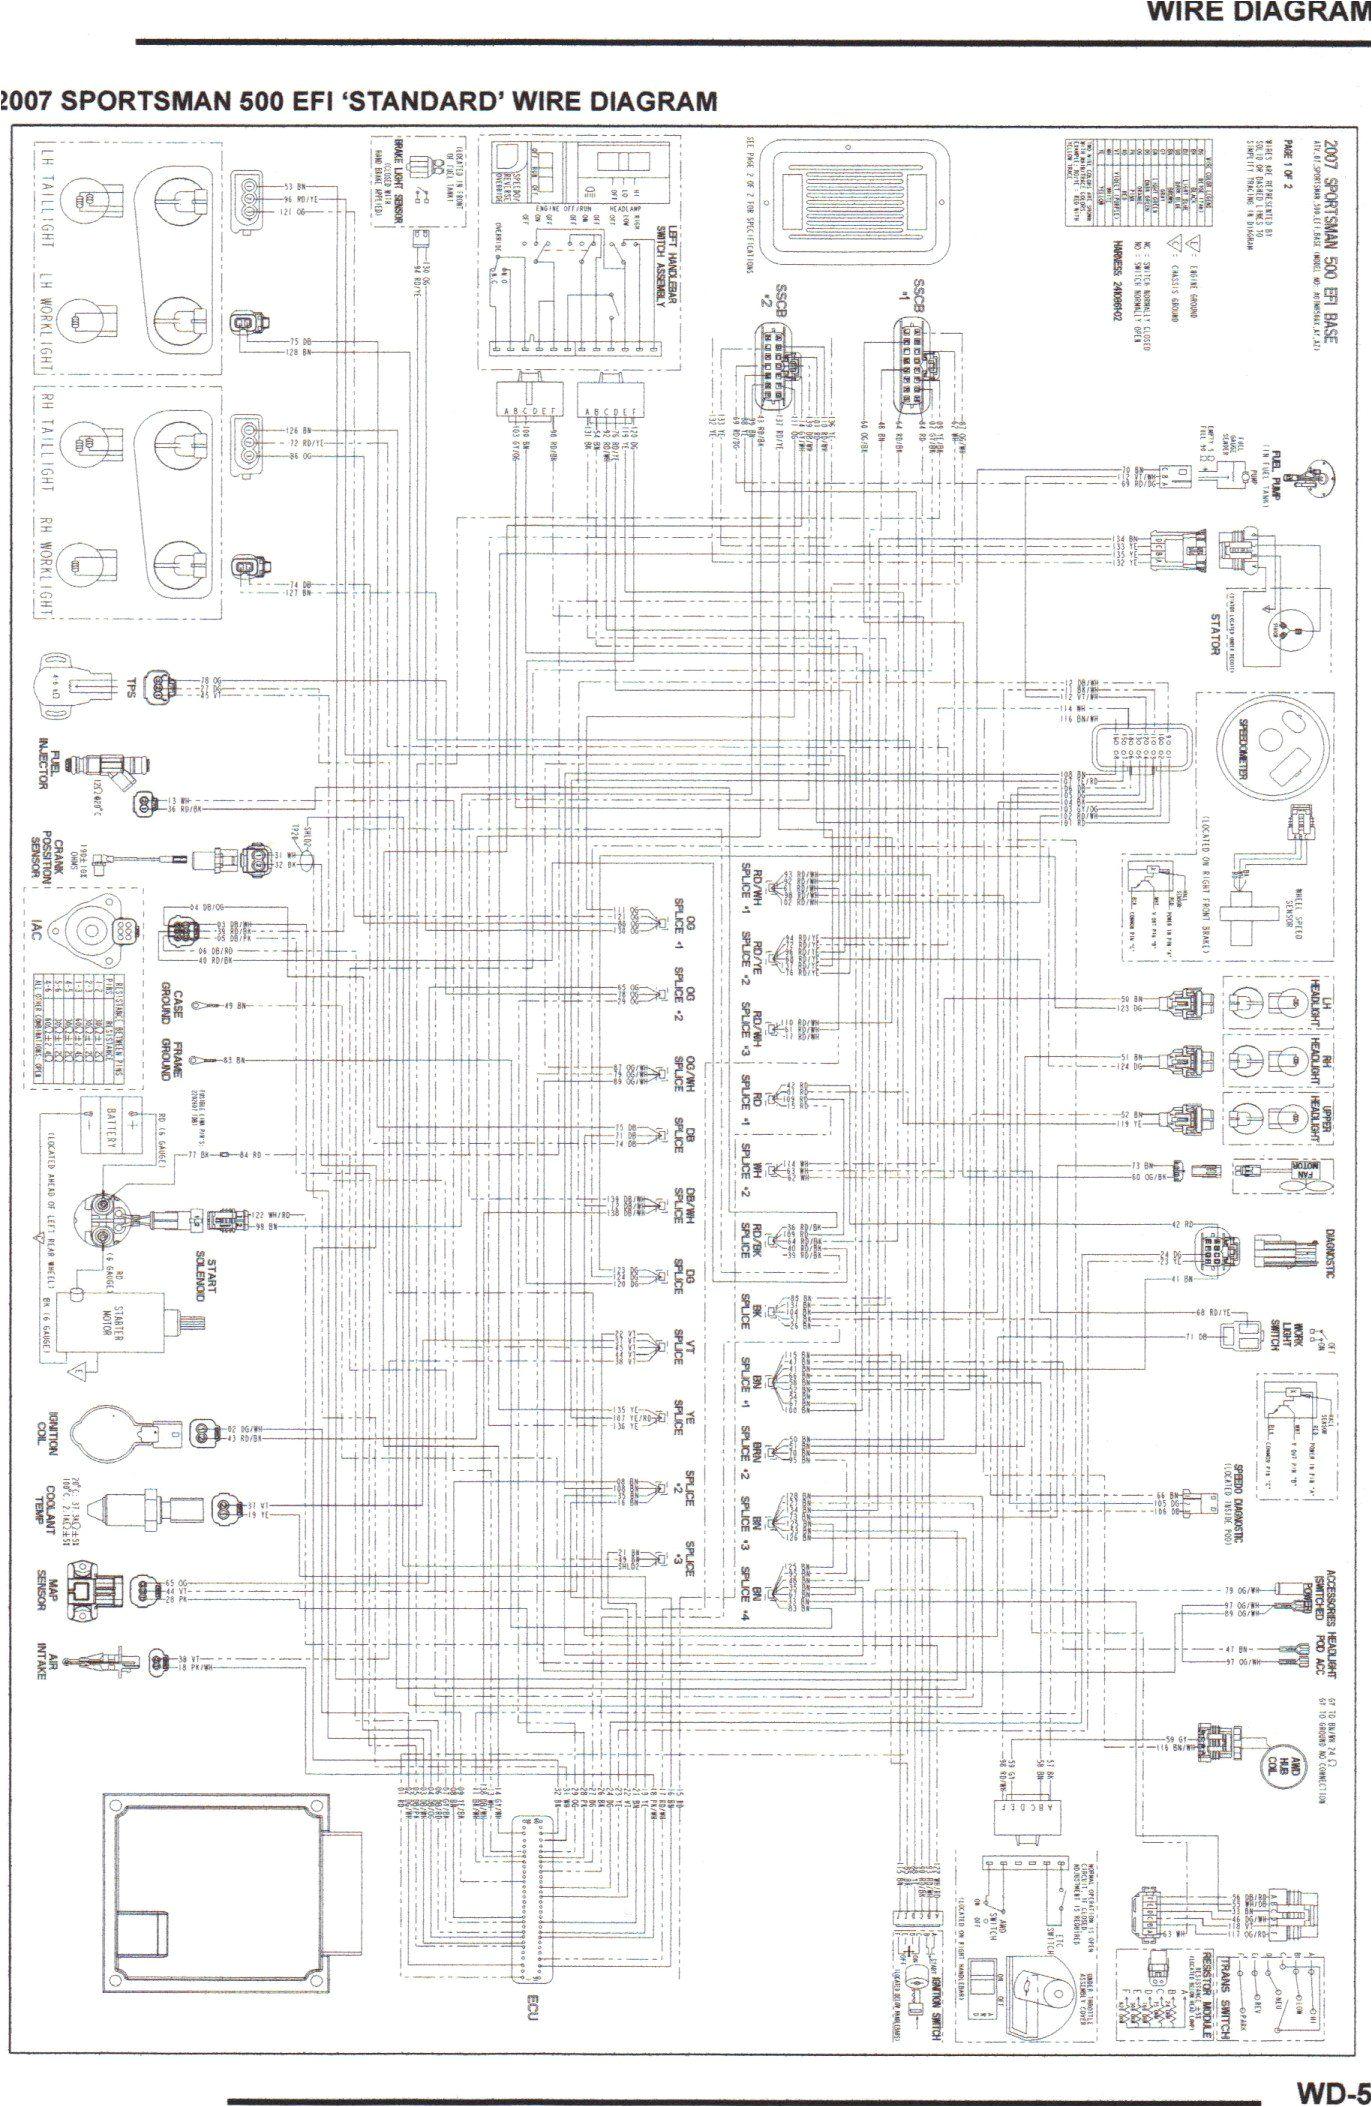 comfortable 2004 polaris sportsman wiring diagram images withcomfortable 2004 polaris sportsman wiring diagram images with predator